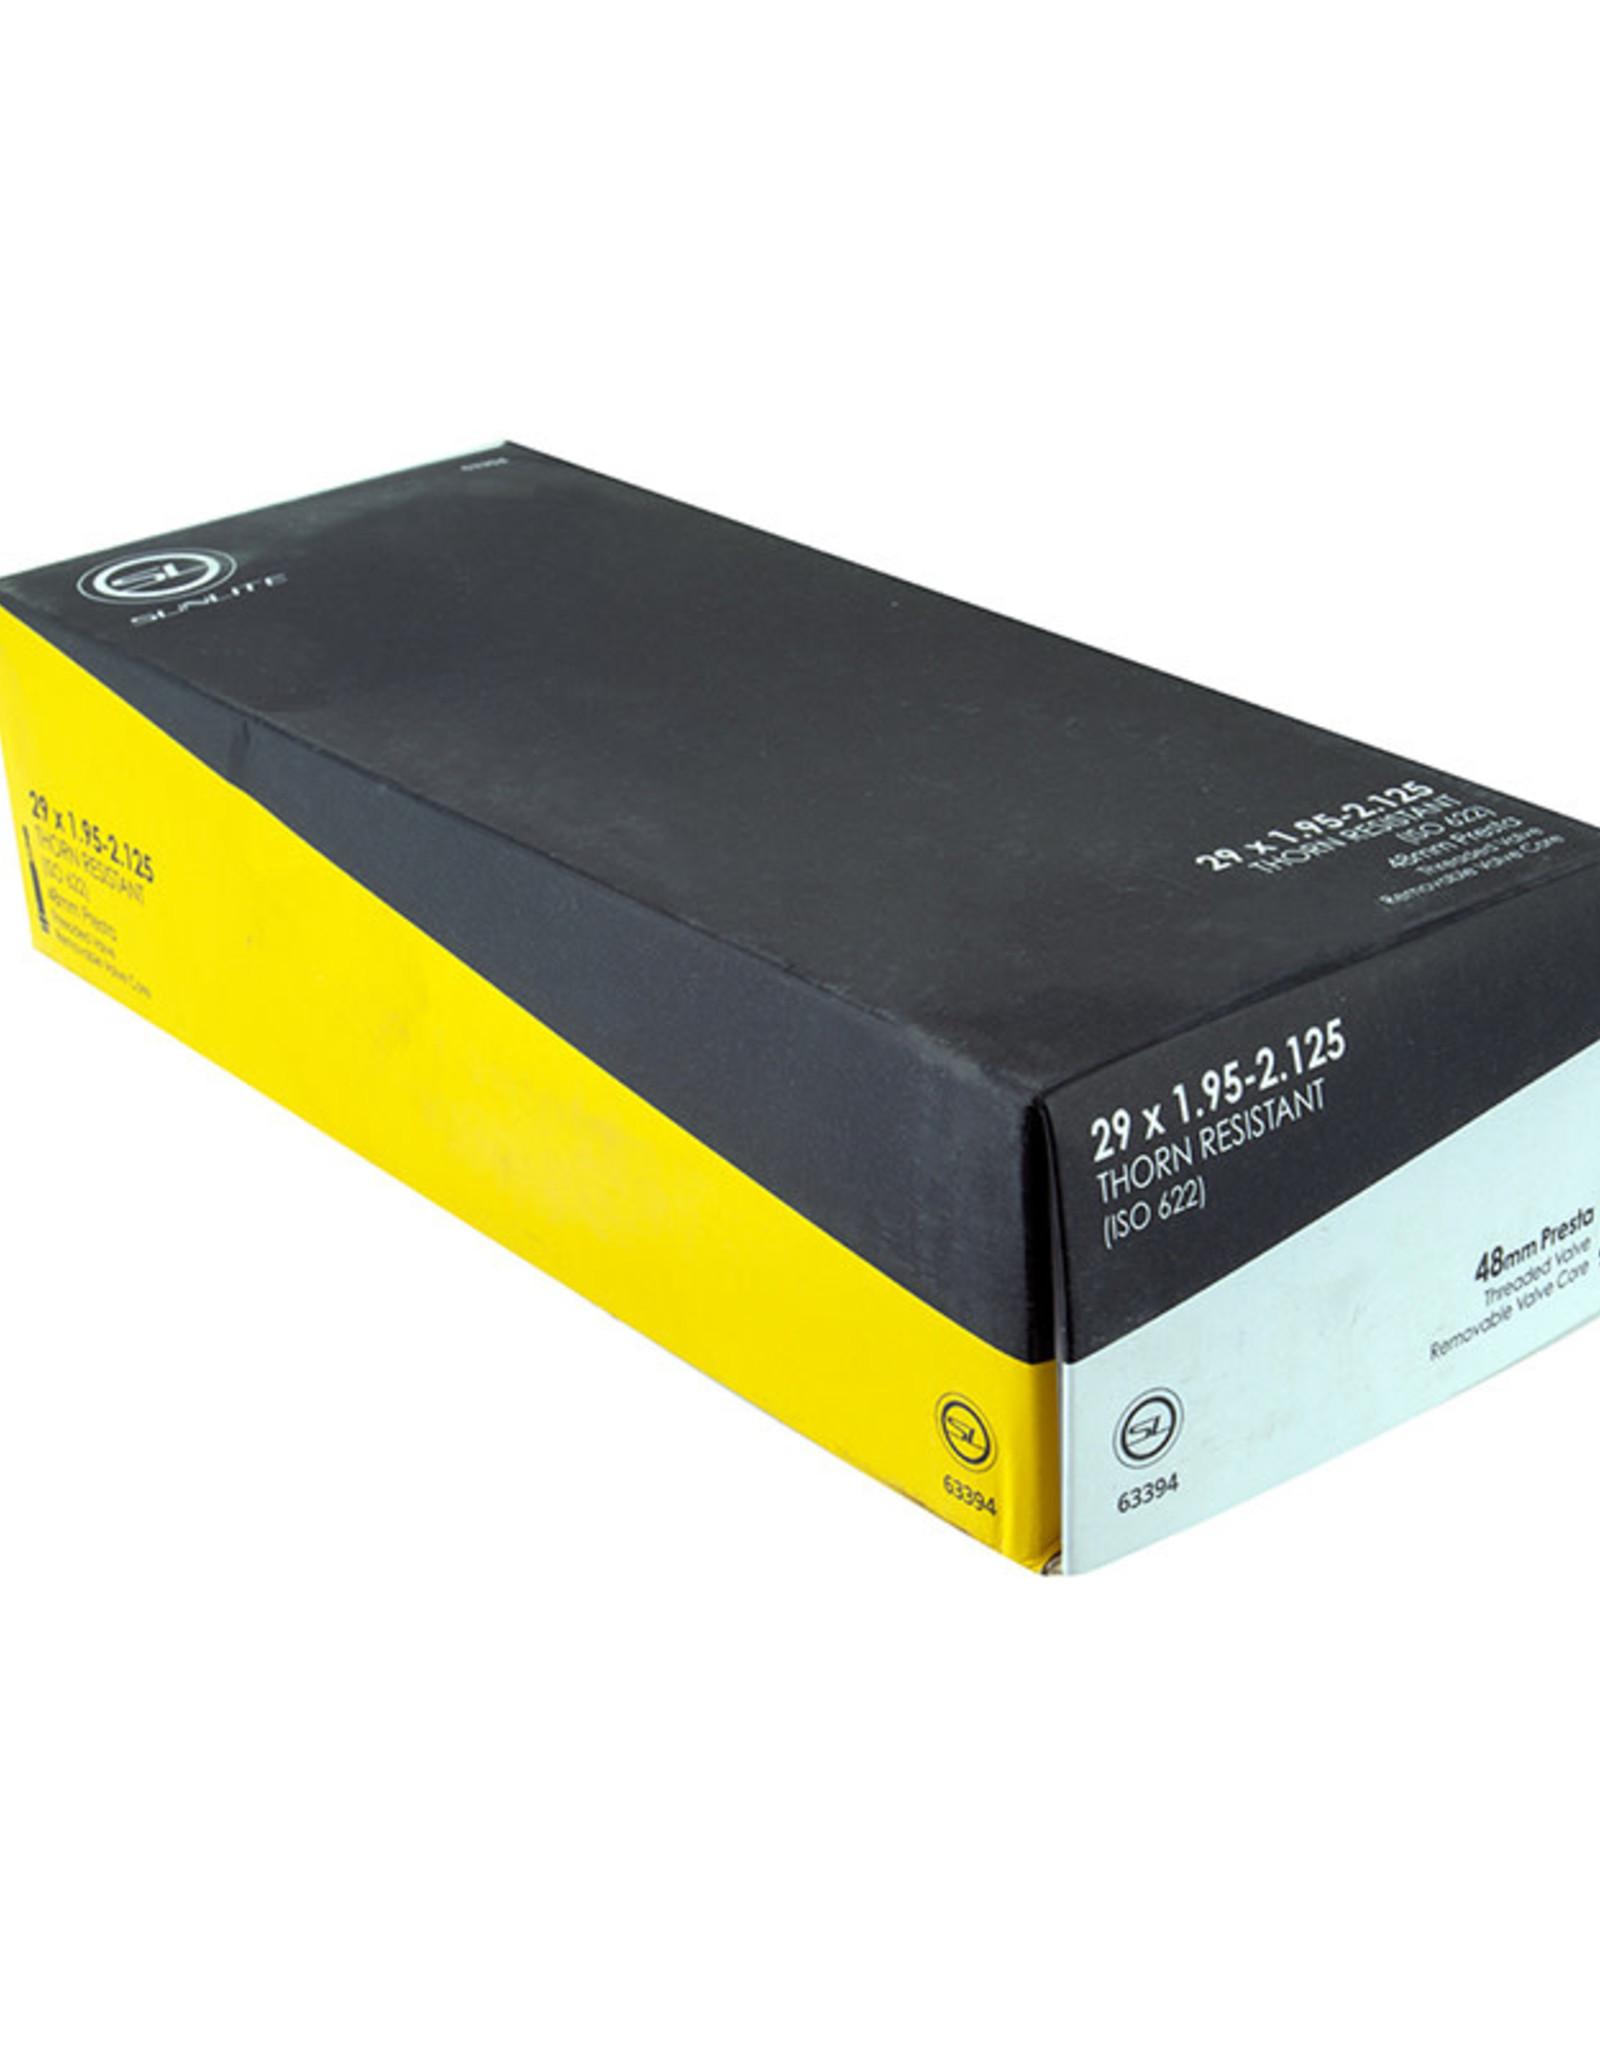 Sunlite Thorn Resistant TUBE 29x1.95-2.1 PV 48MM